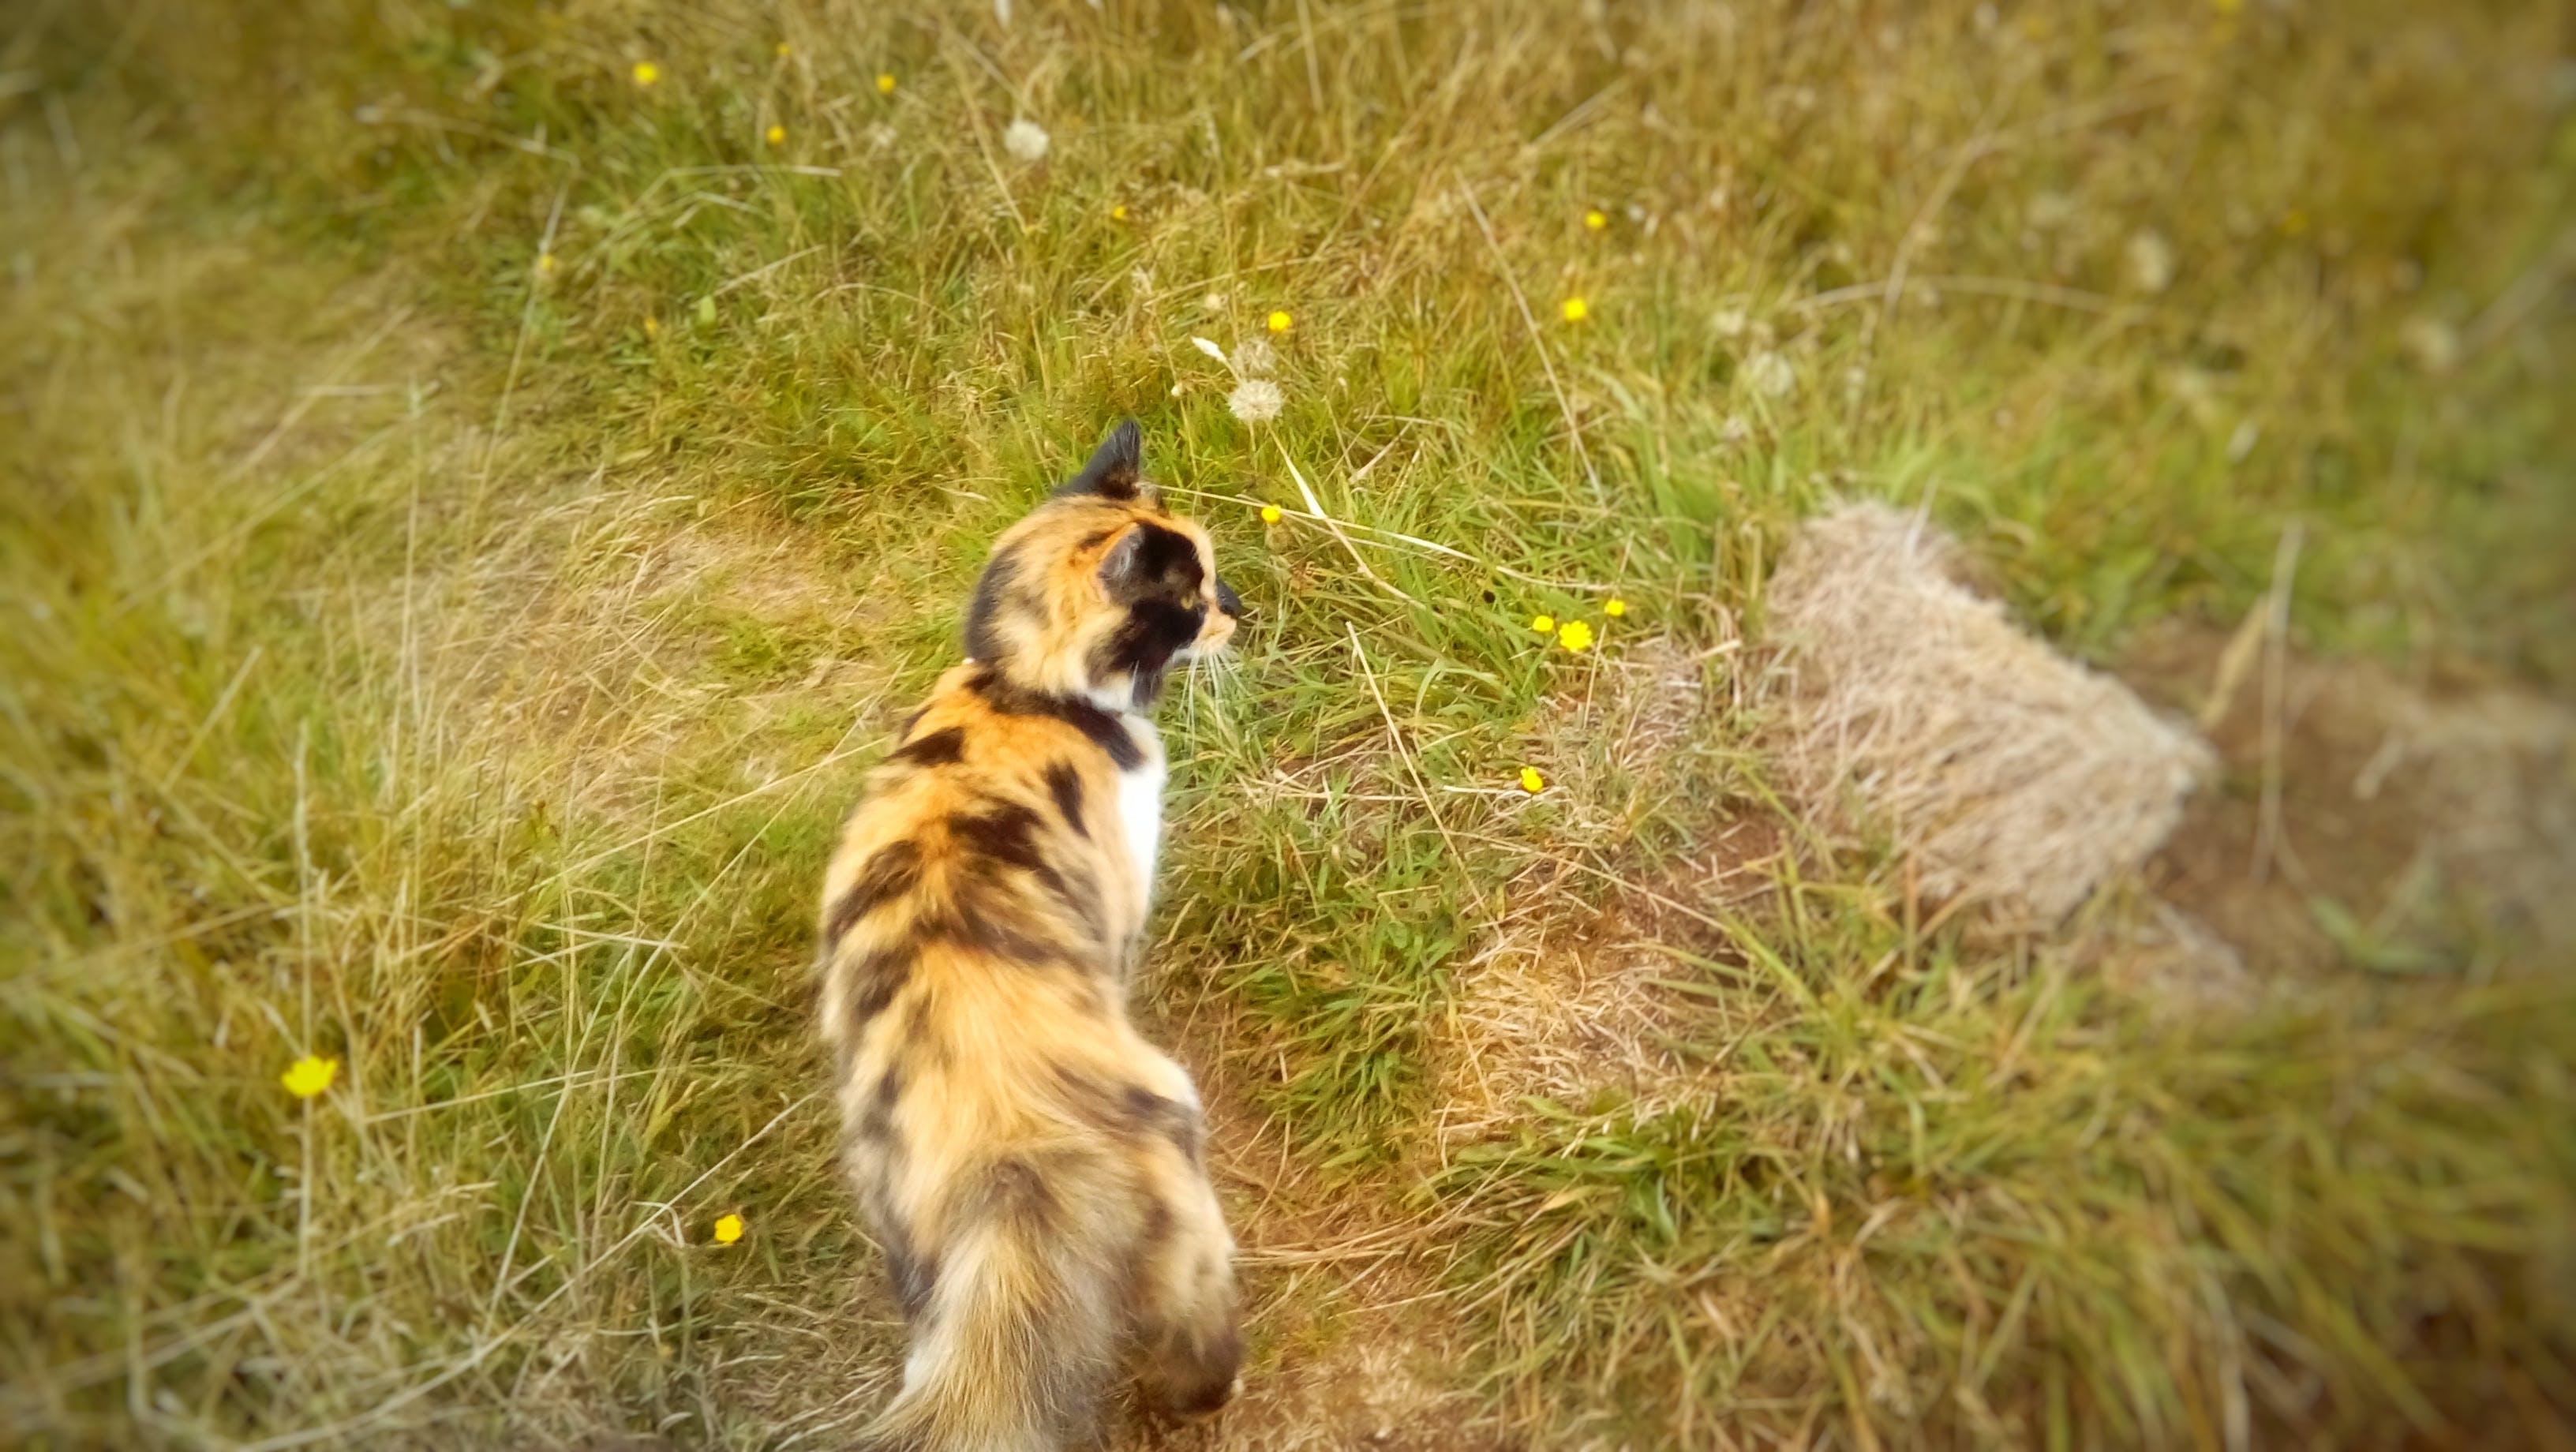 Free stock photo of cat, grass, nature